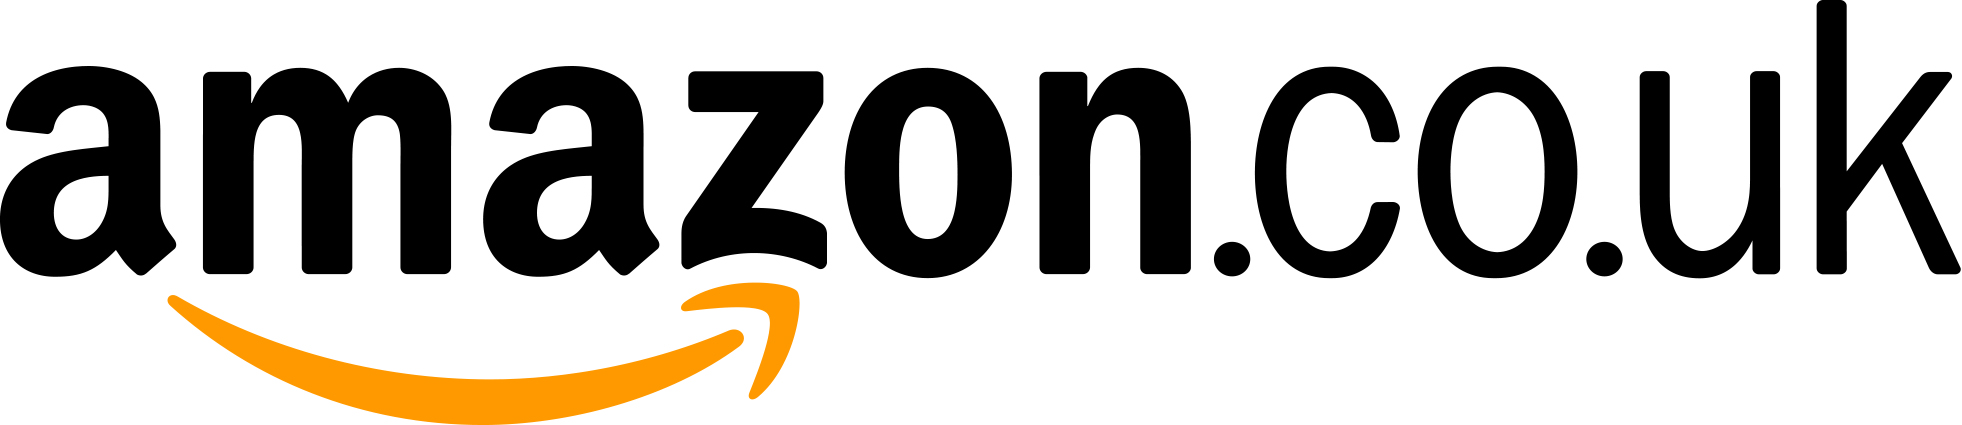 Image result for Amazon UK image